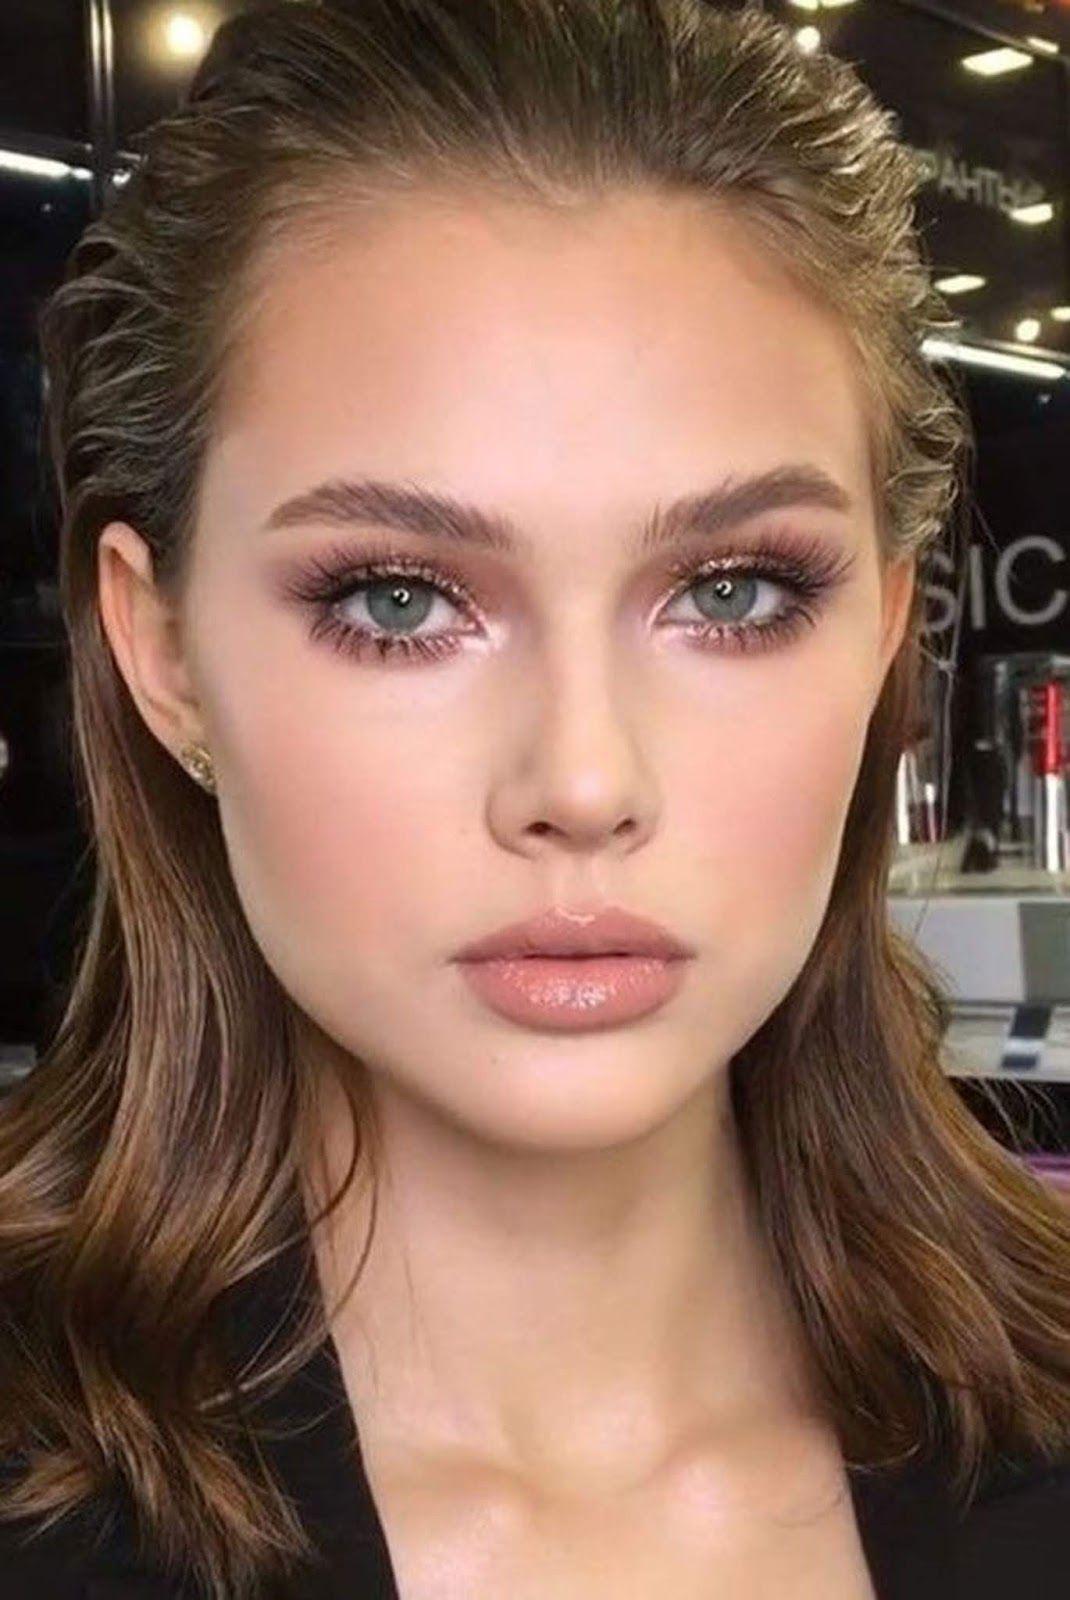 chic and elegant makeup idea to copy Natural makeup